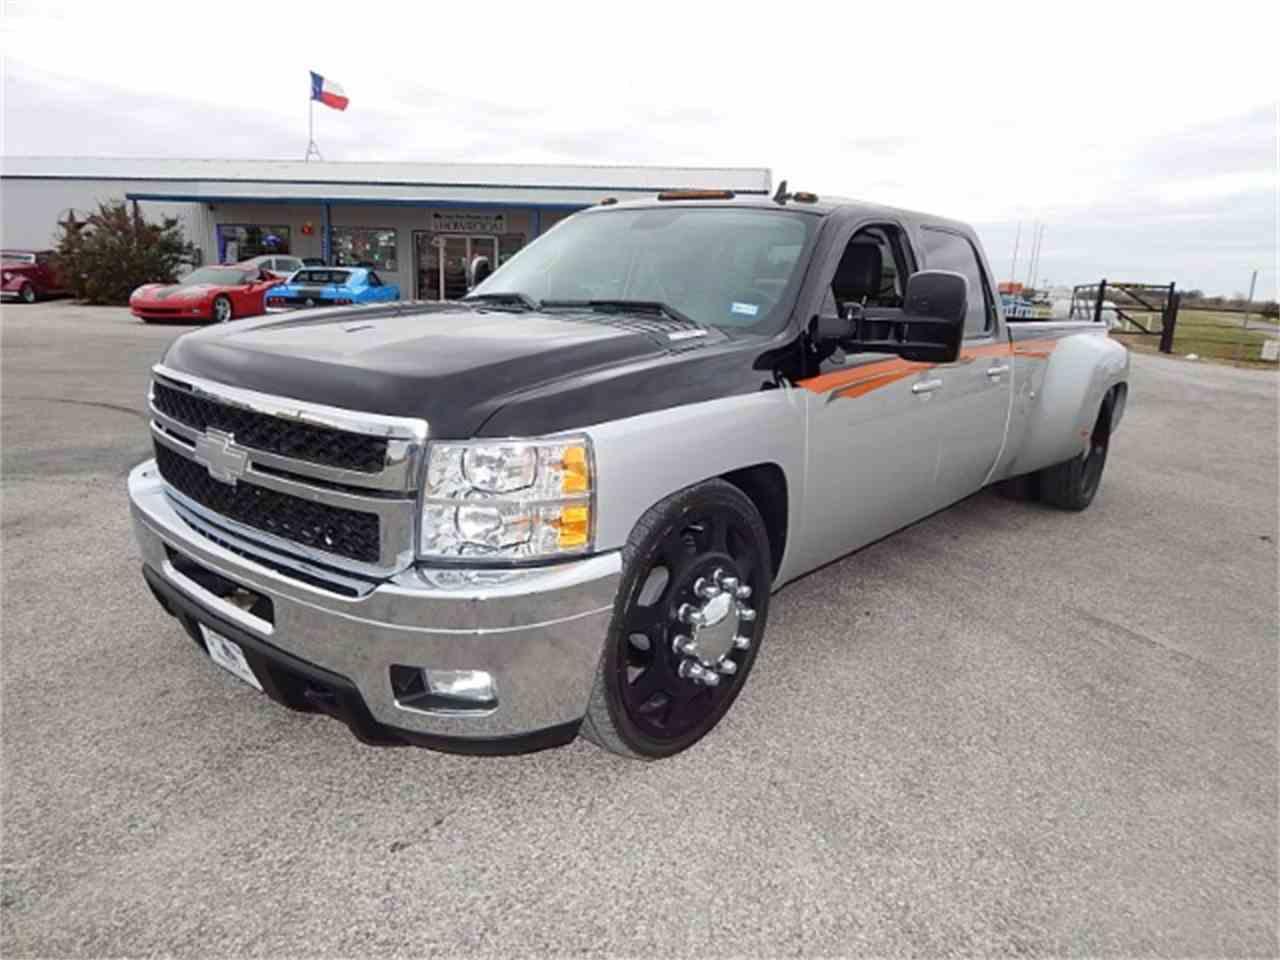 2011 Chevrolet Silverado for Sale - CC-990909